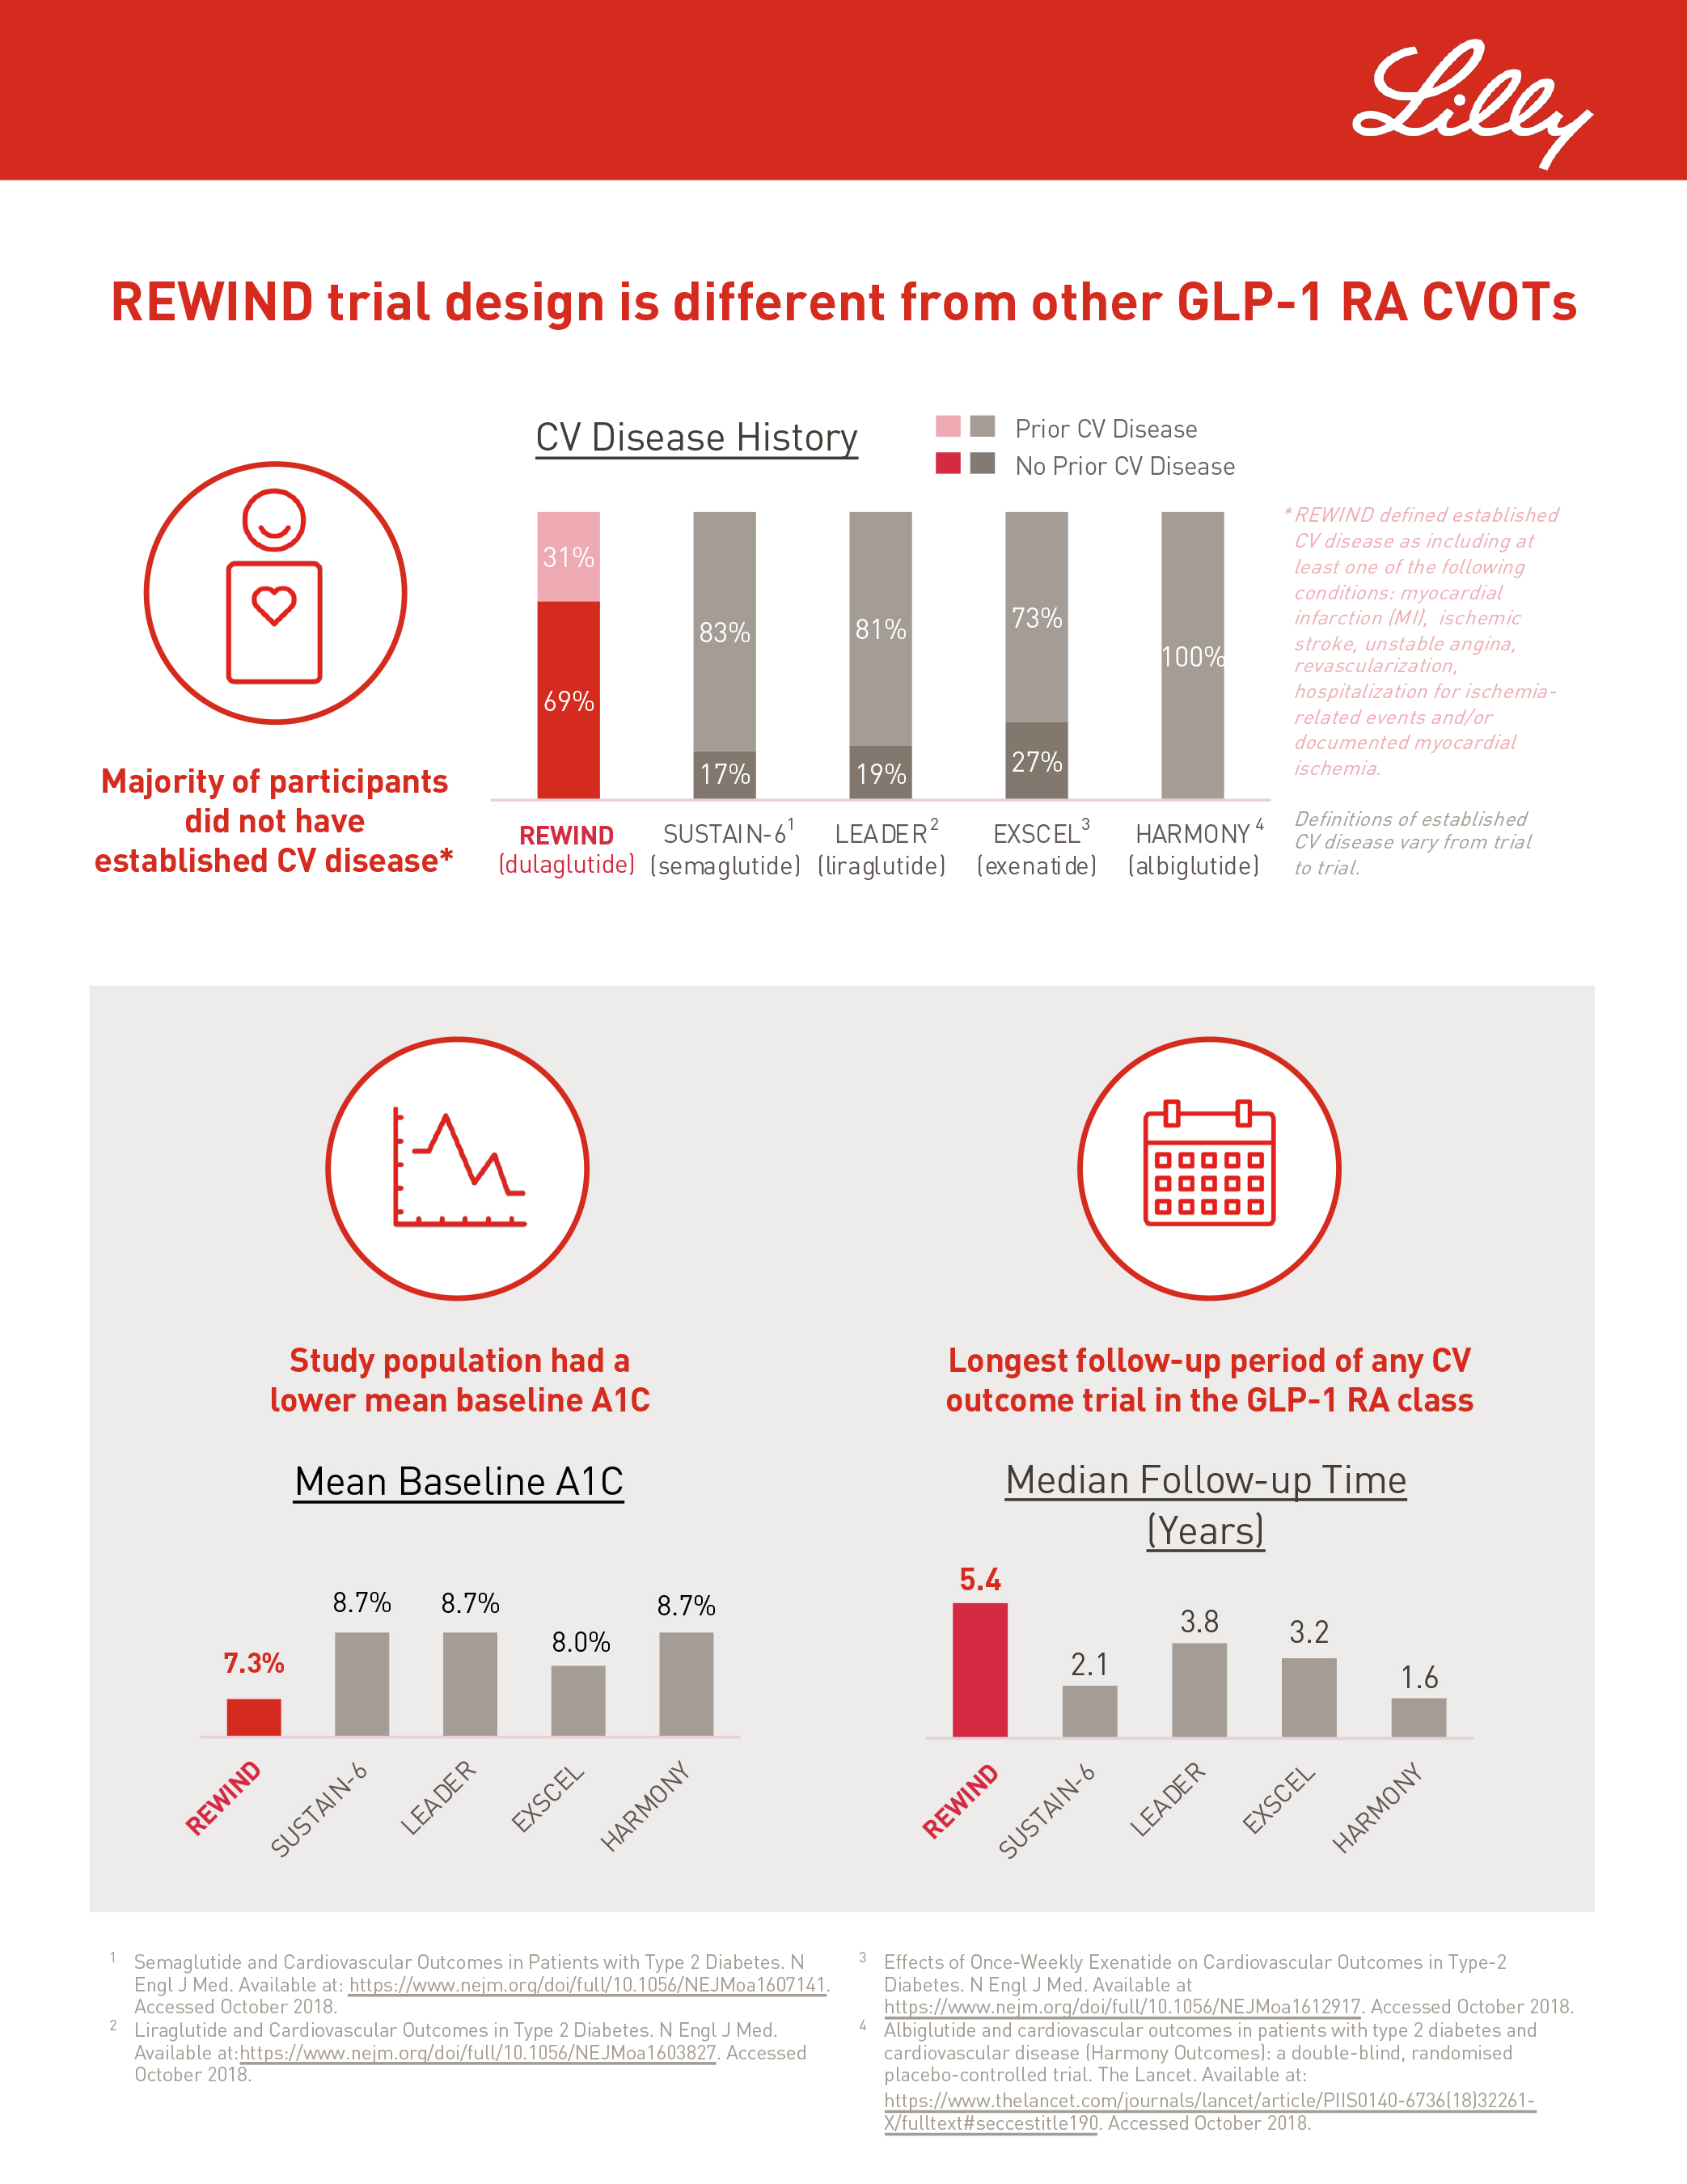 REWIND trial infographic